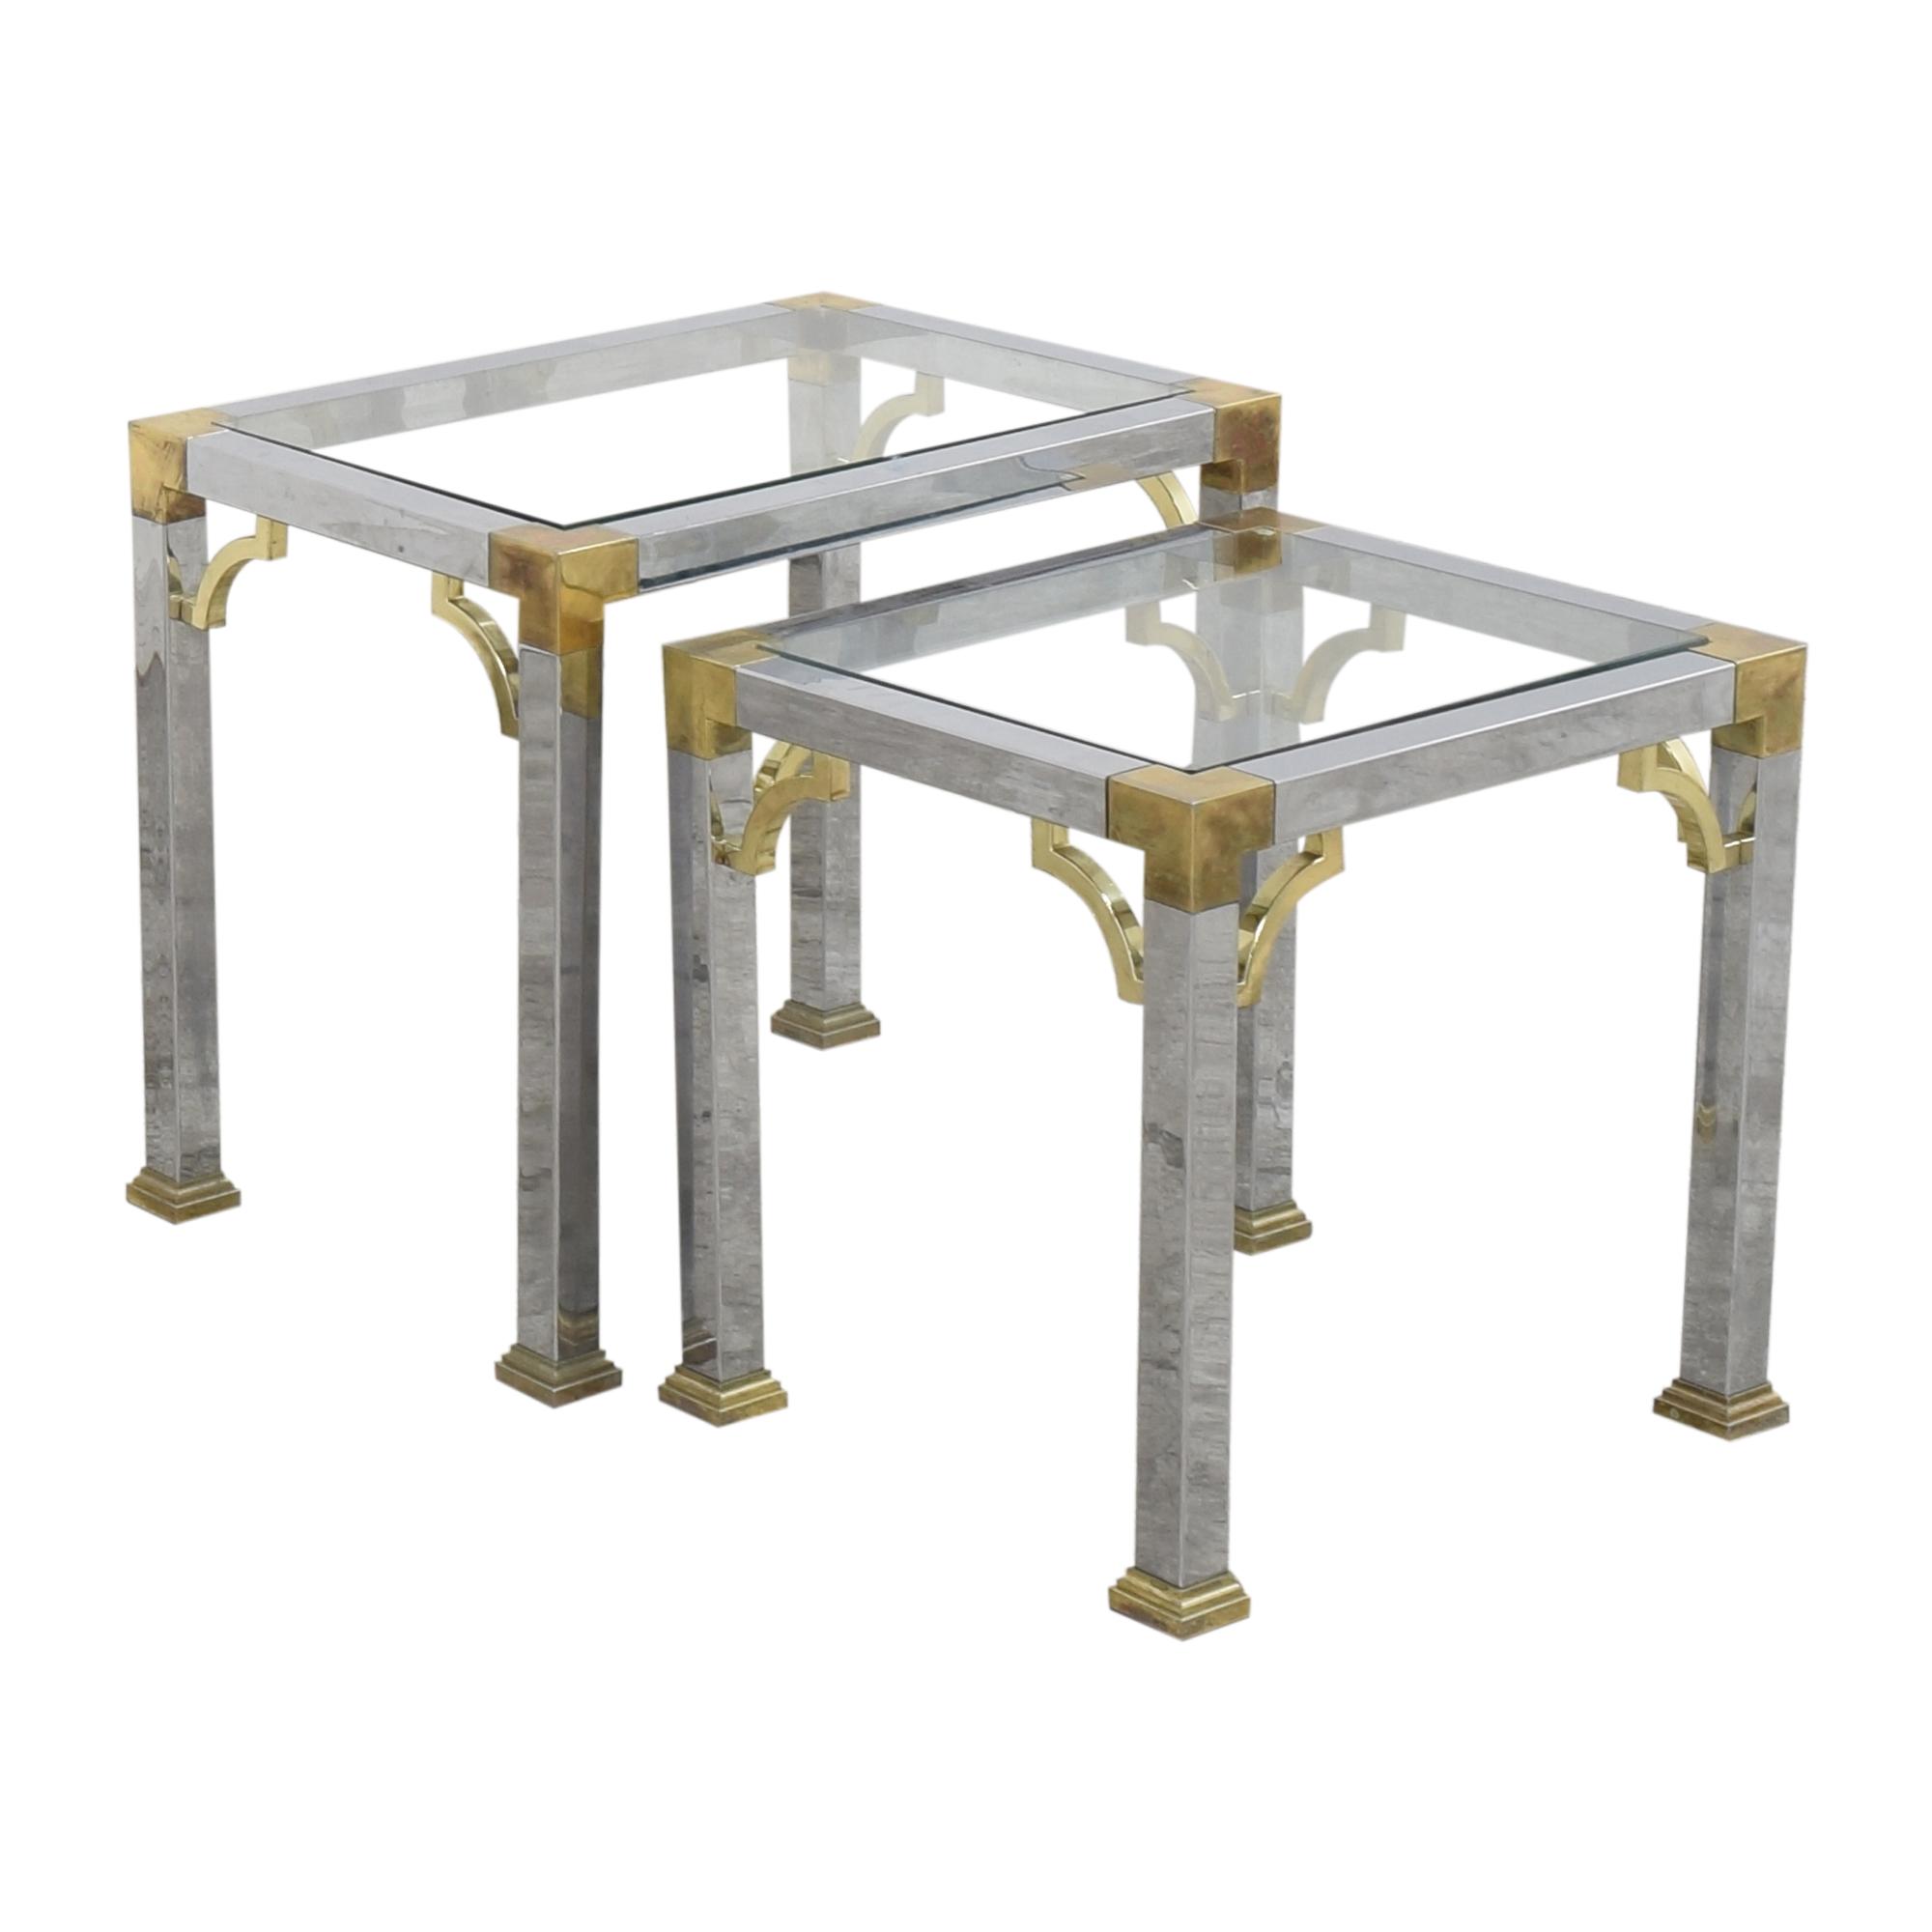 shop B. Altman Nesting End Tables B. Altman Tables